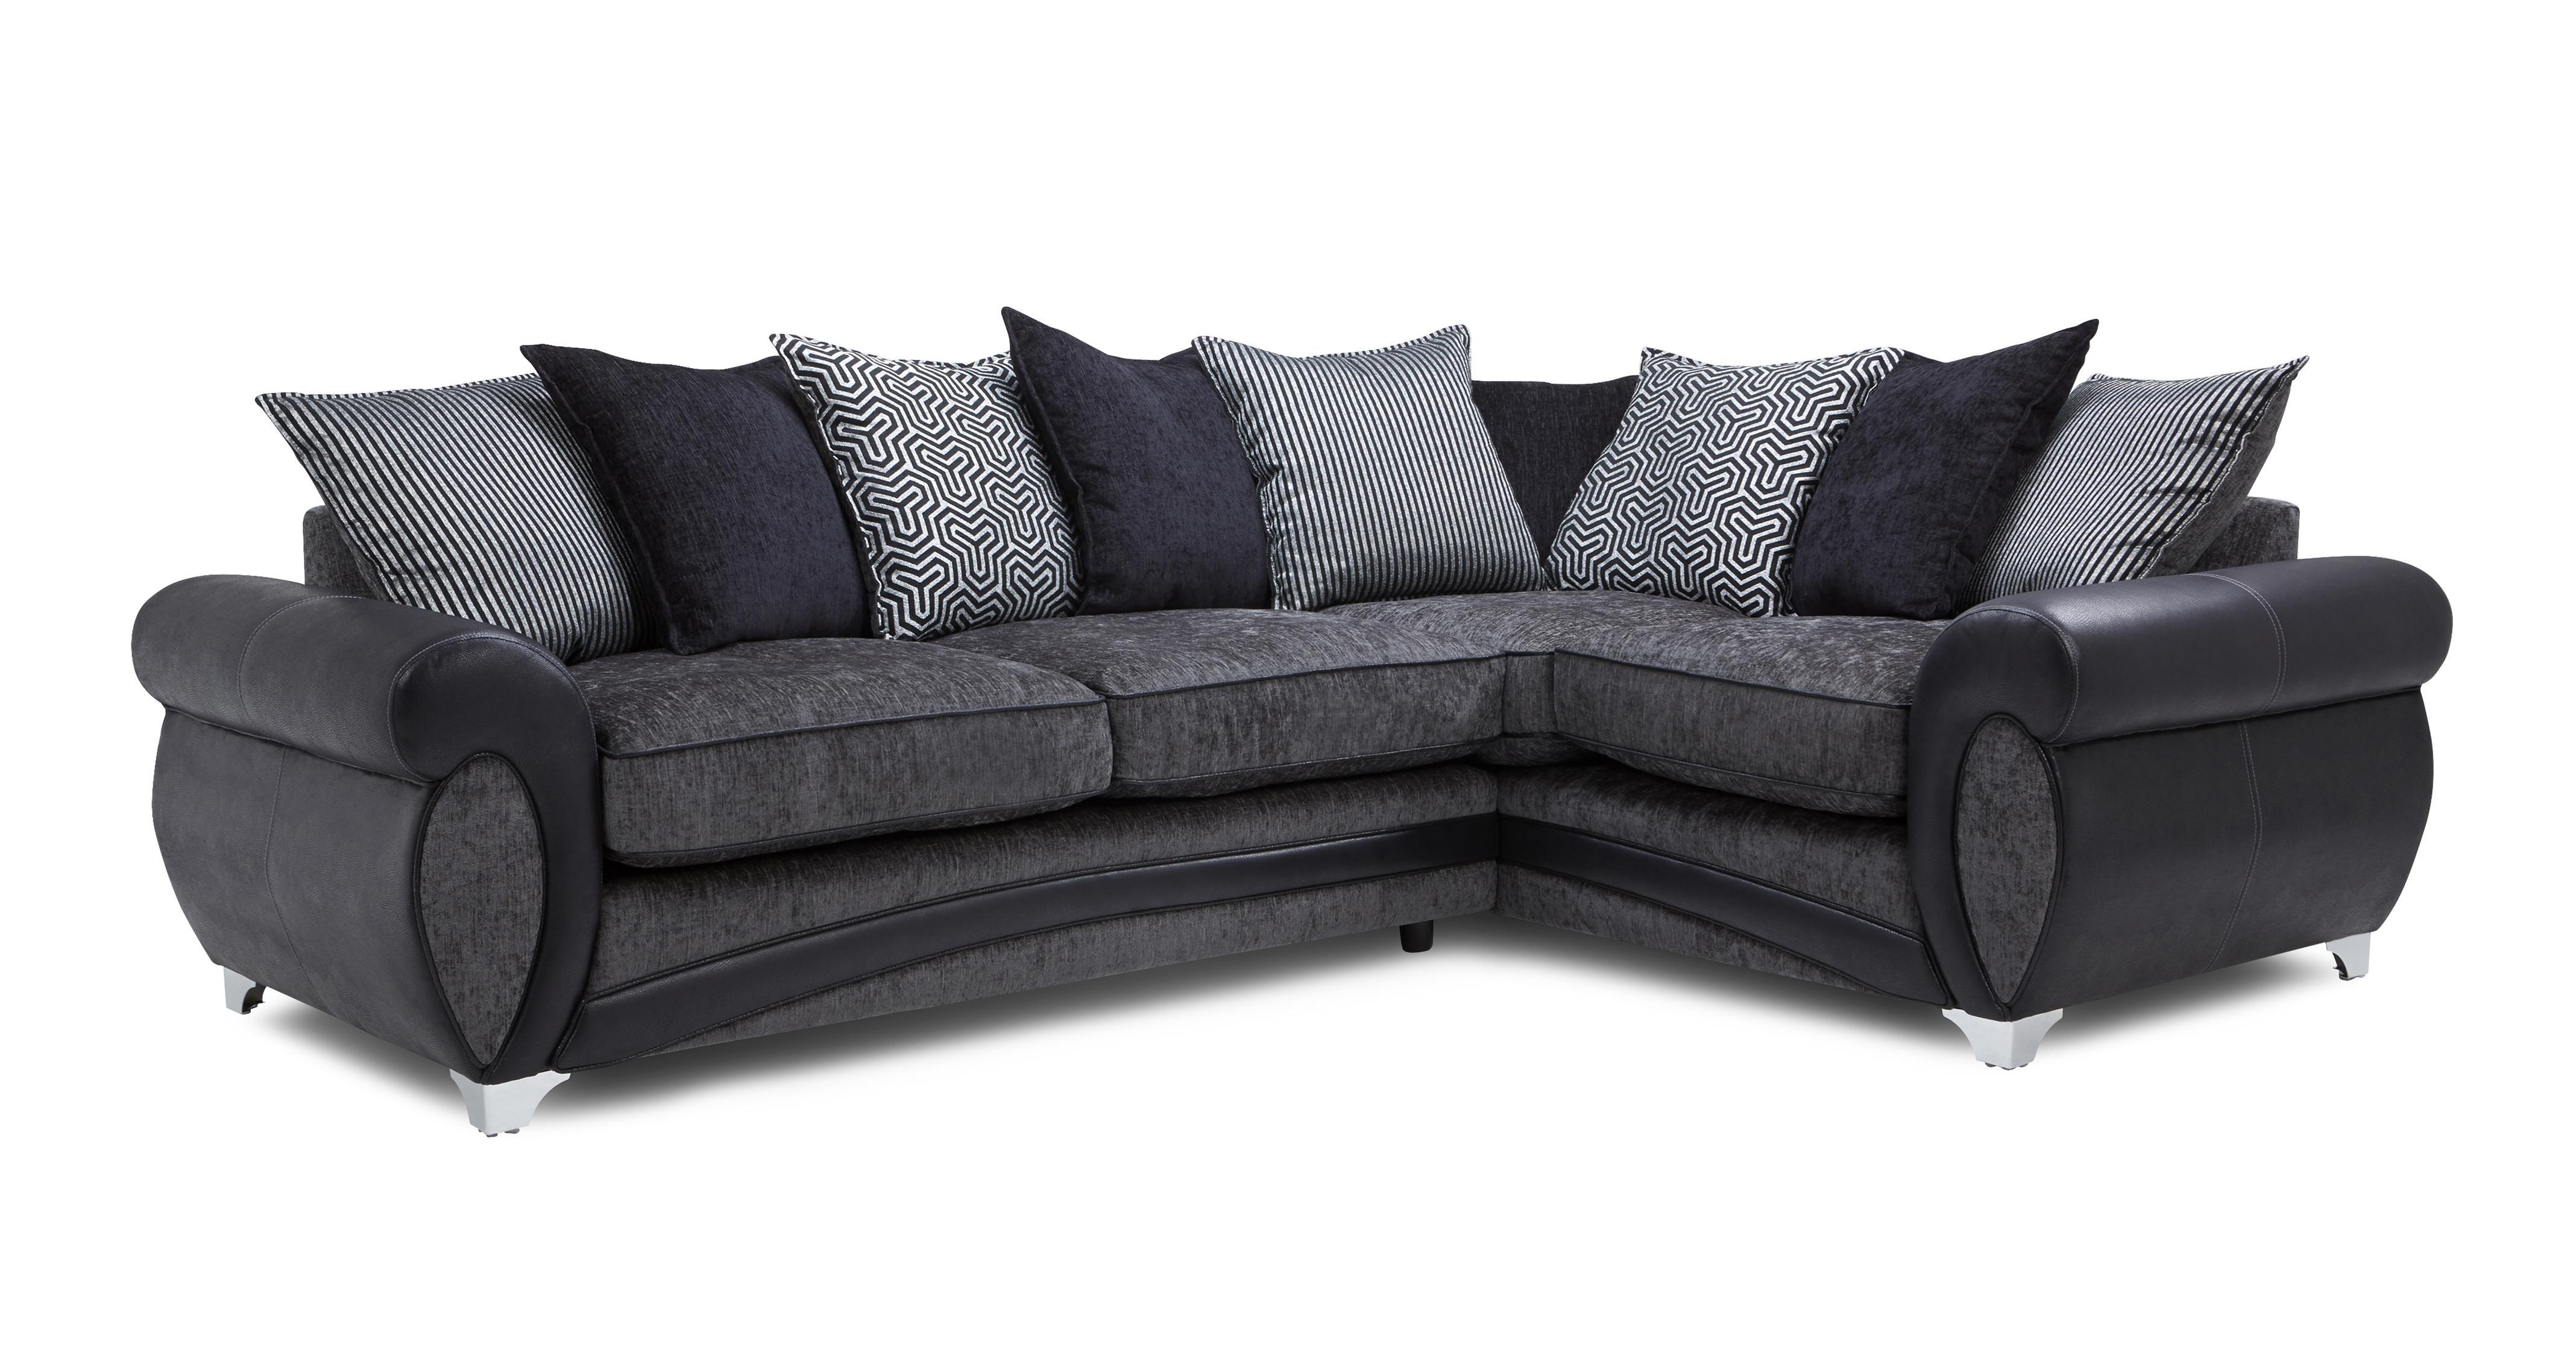 Amara Left Hand Facing 3 Seater Pillow Back Corner Sofa